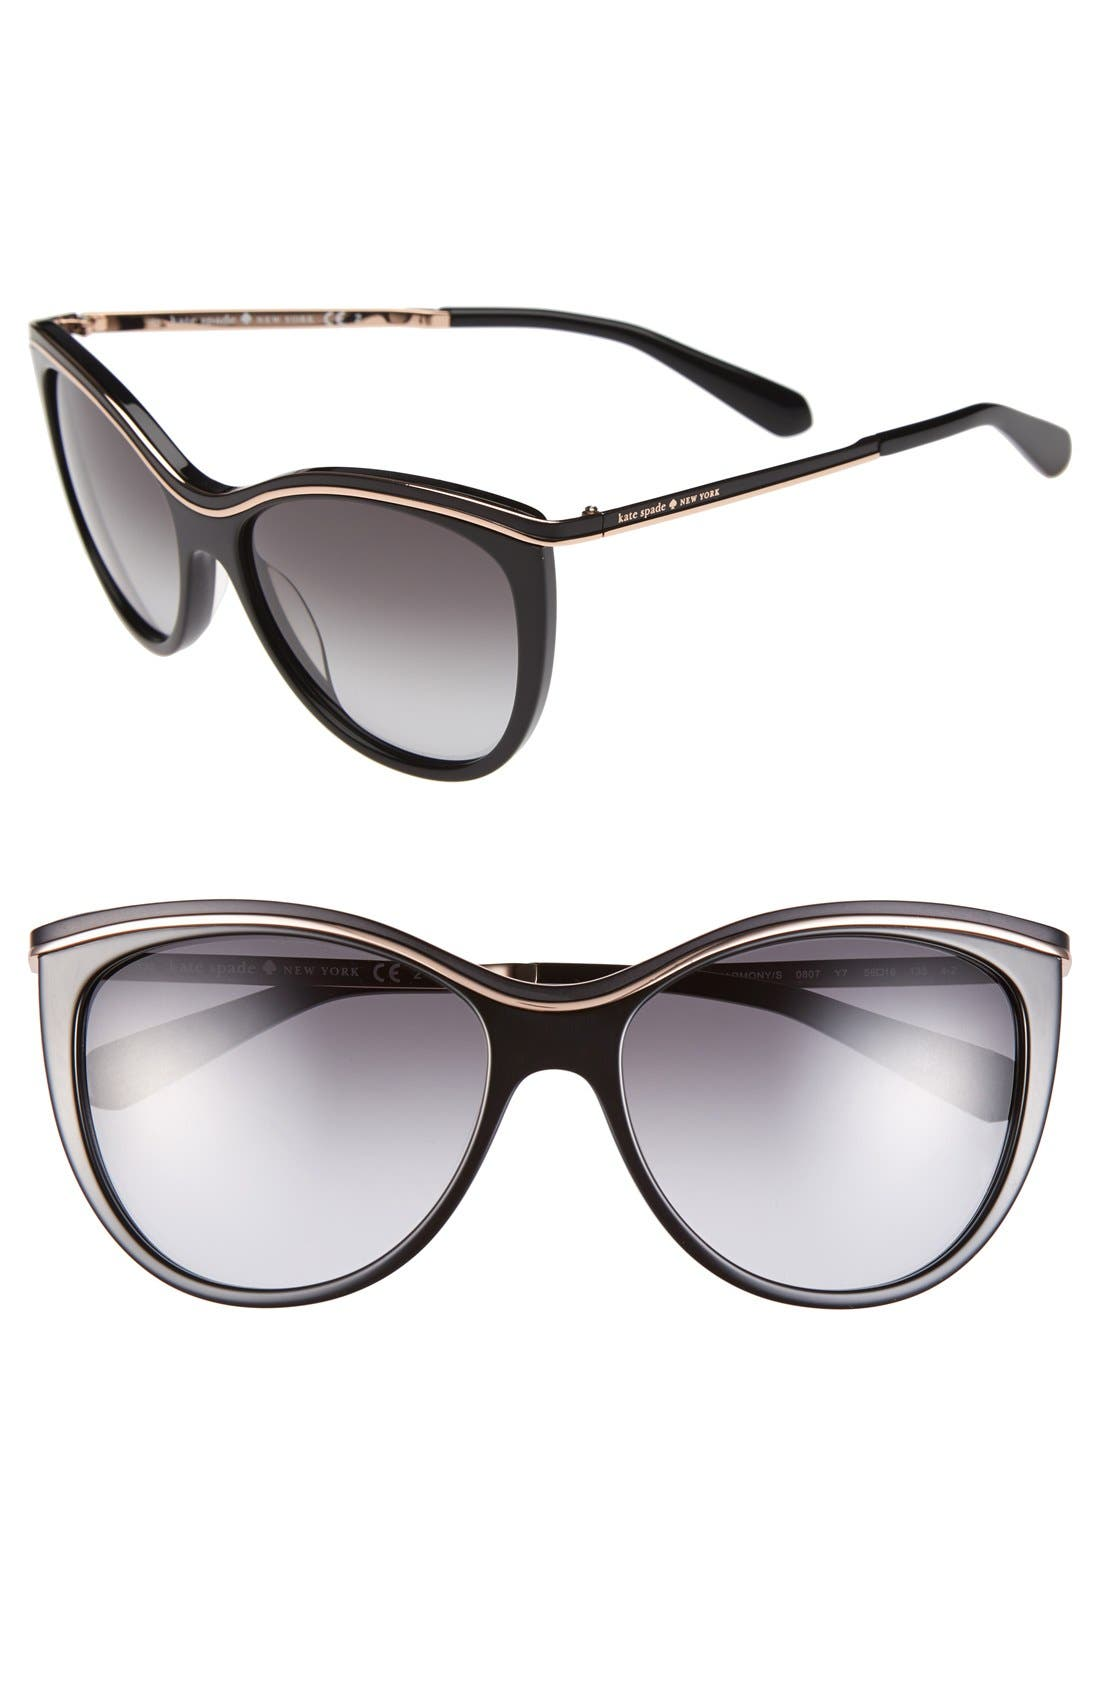 KATE SPADE NEW YORK,                             56mm cat eye sunglasses,                             Main thumbnail 1, color,                             001